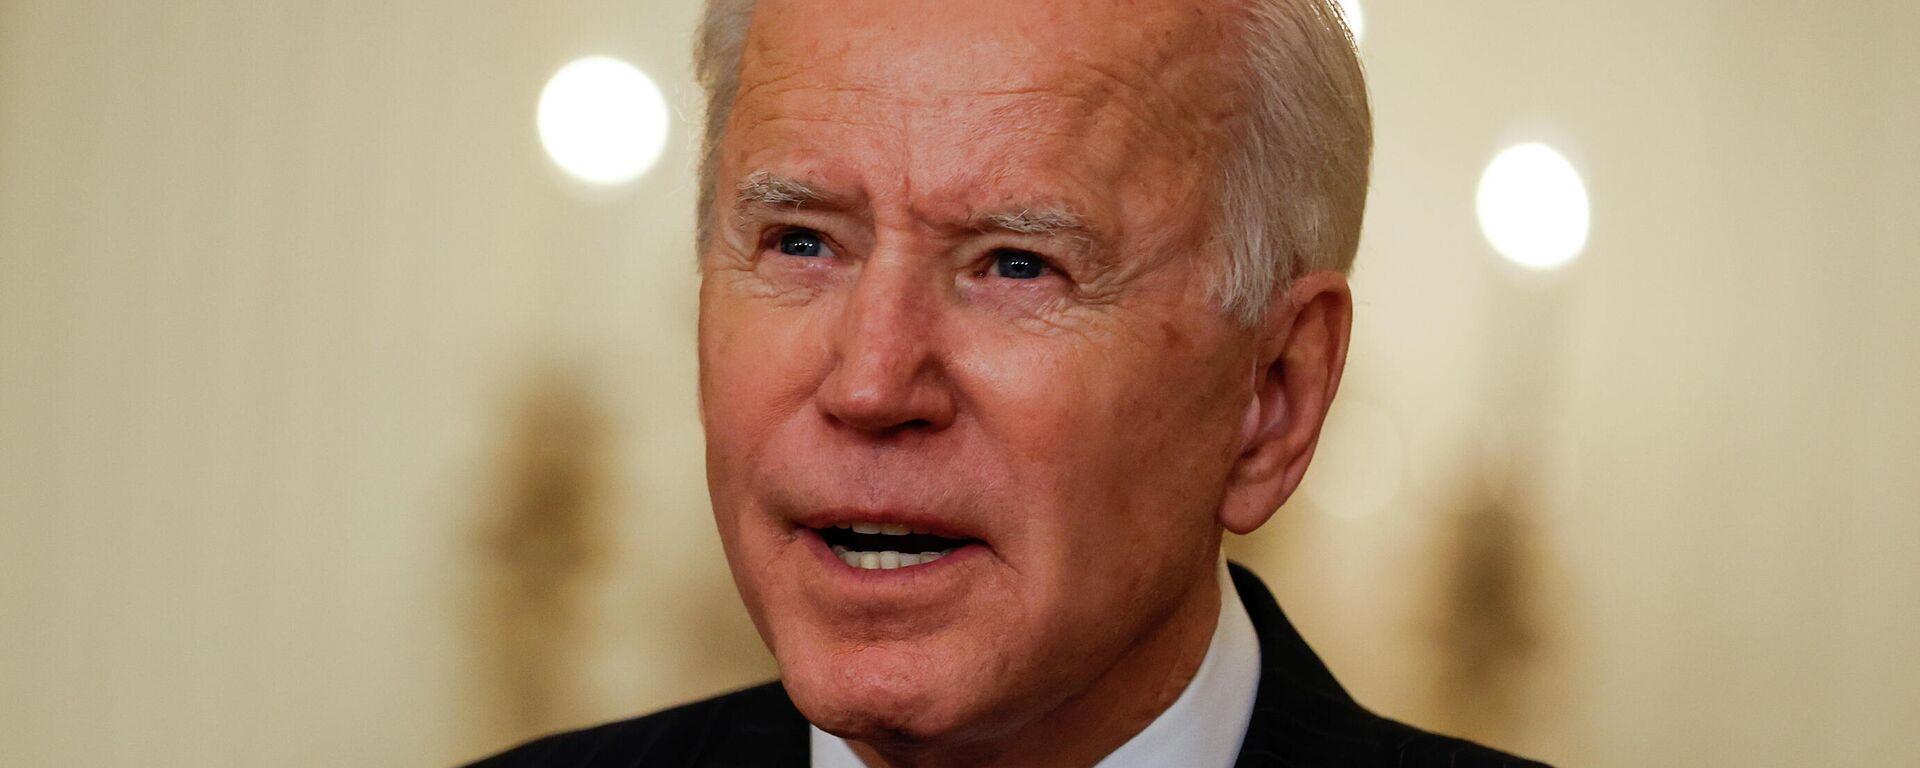 Joe Biden, presidente de EEUU - Sputnik Mundo, 1920, 19.03.2021